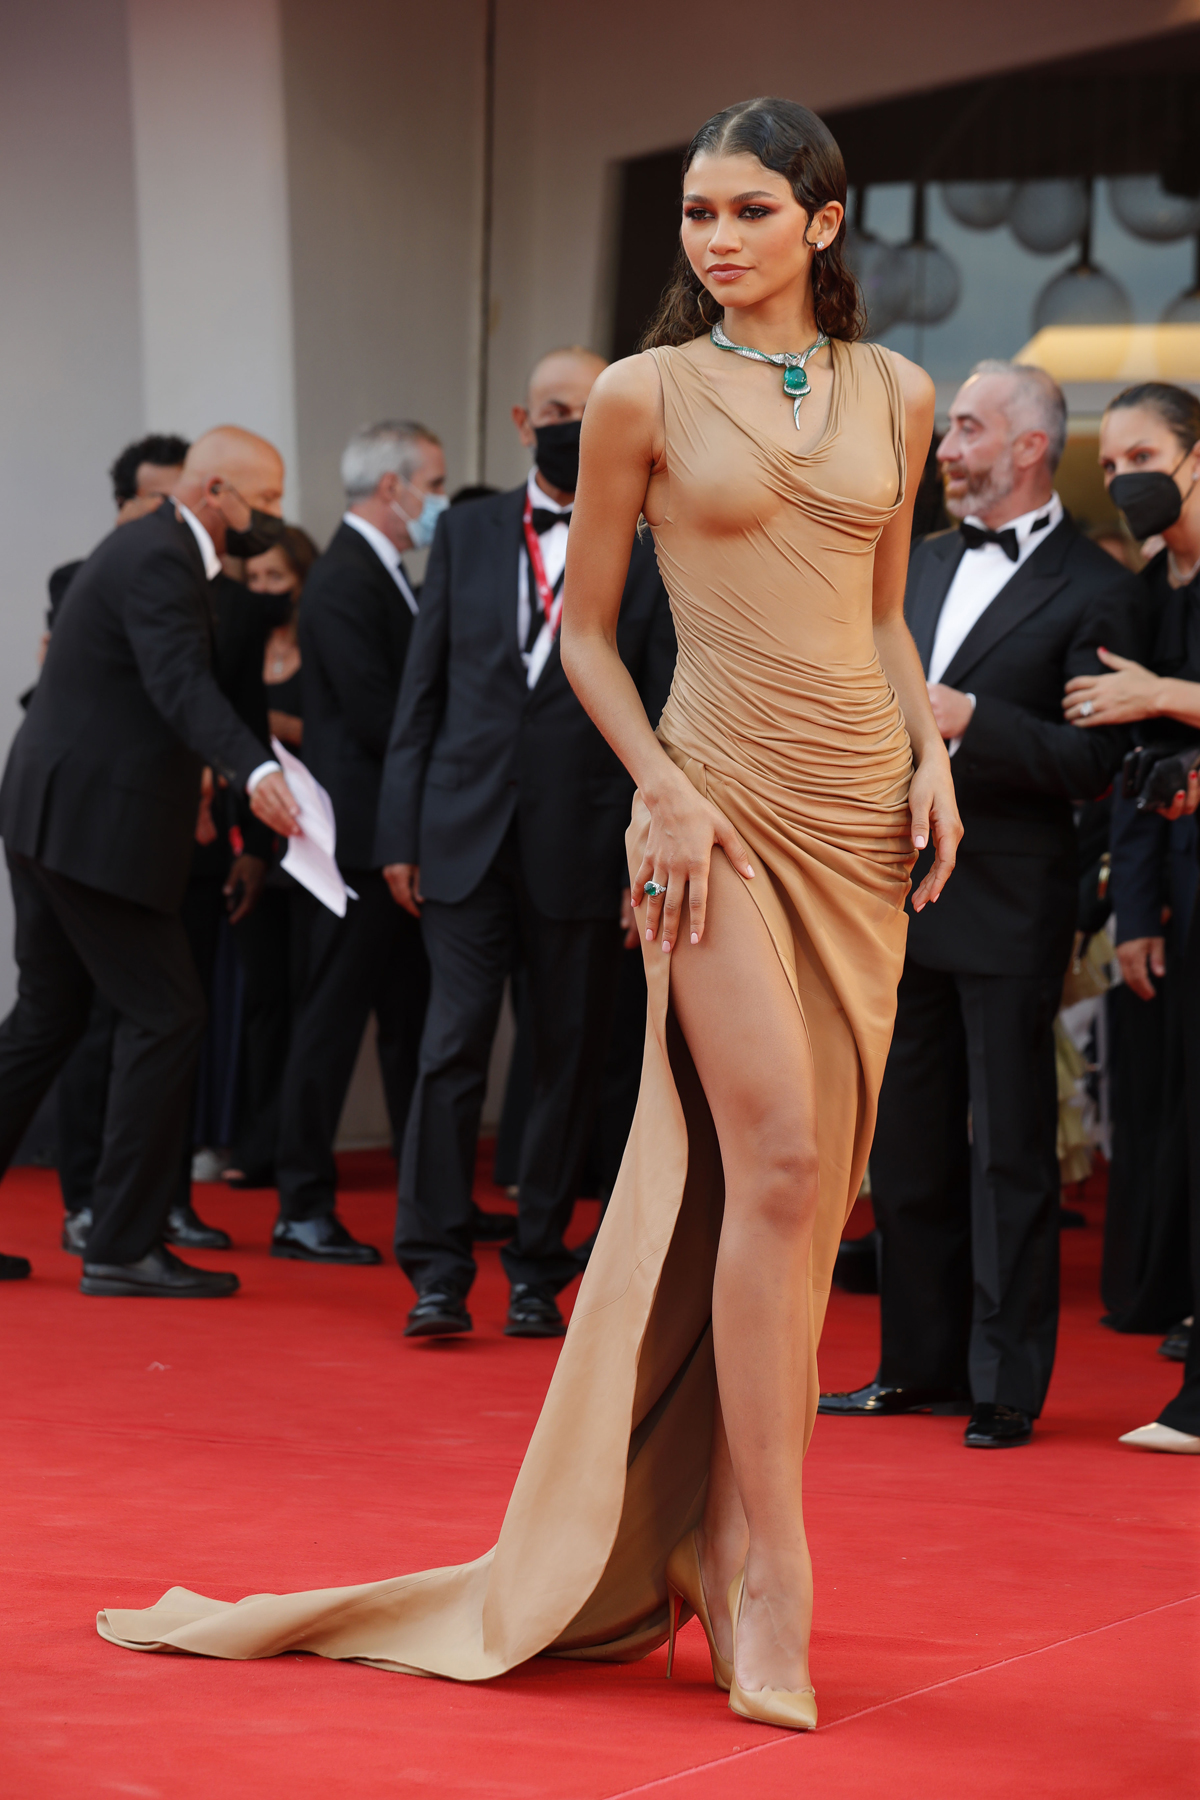 Zendaya Clingy Nude Balmain Gown Look For The Venice Film Festival